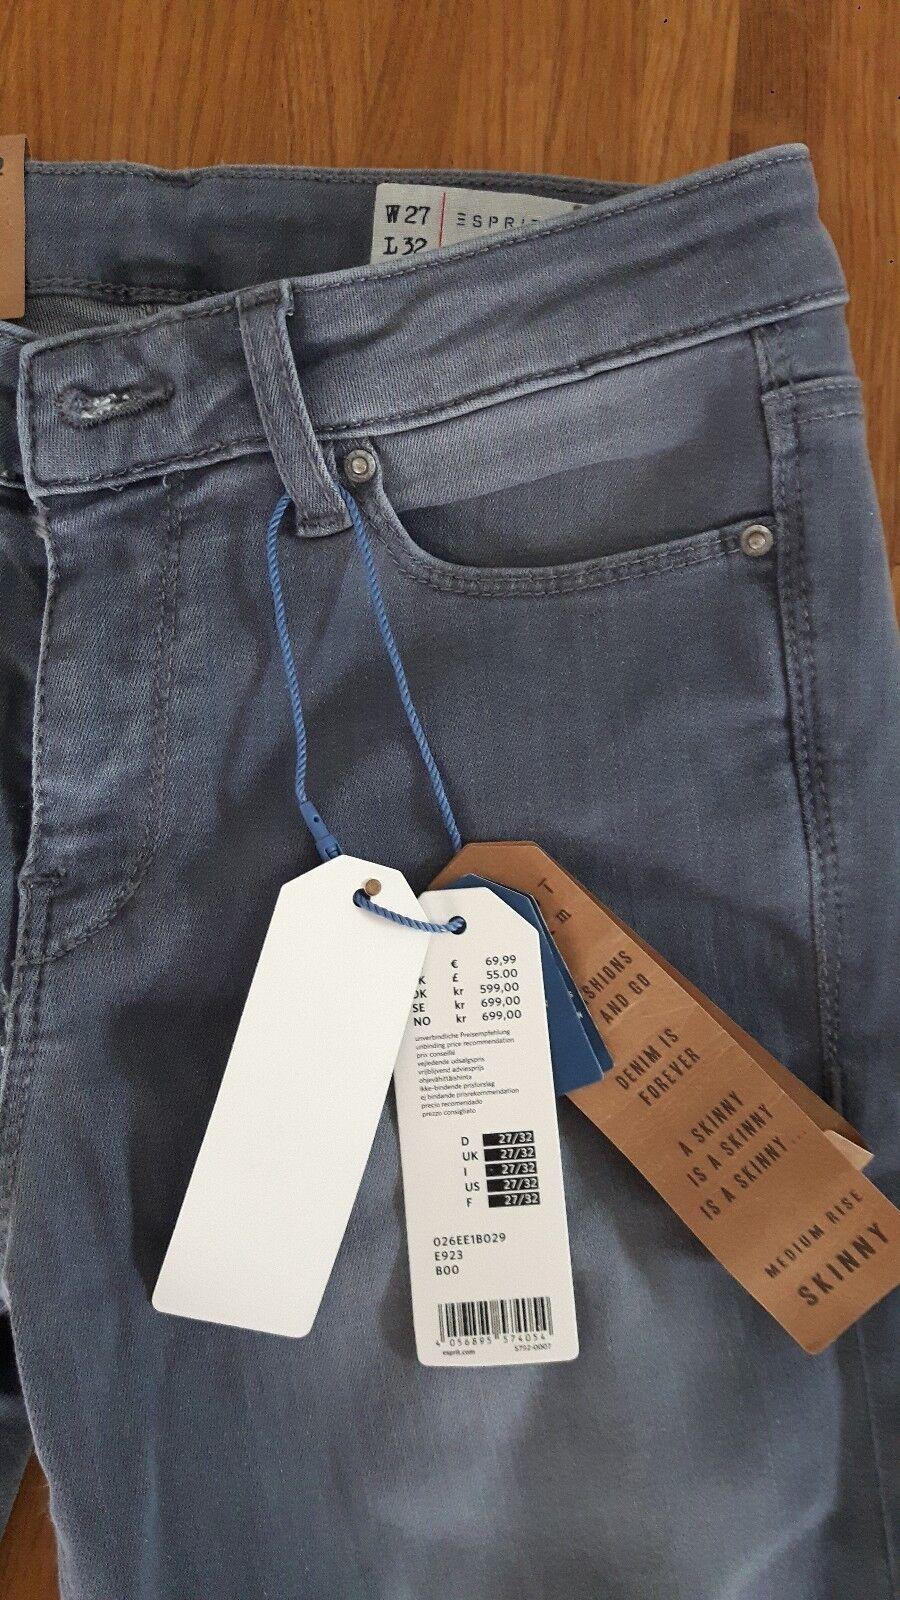 Jeans Esprit Skinny grau Gr.27 32 32 32 NEU 417363